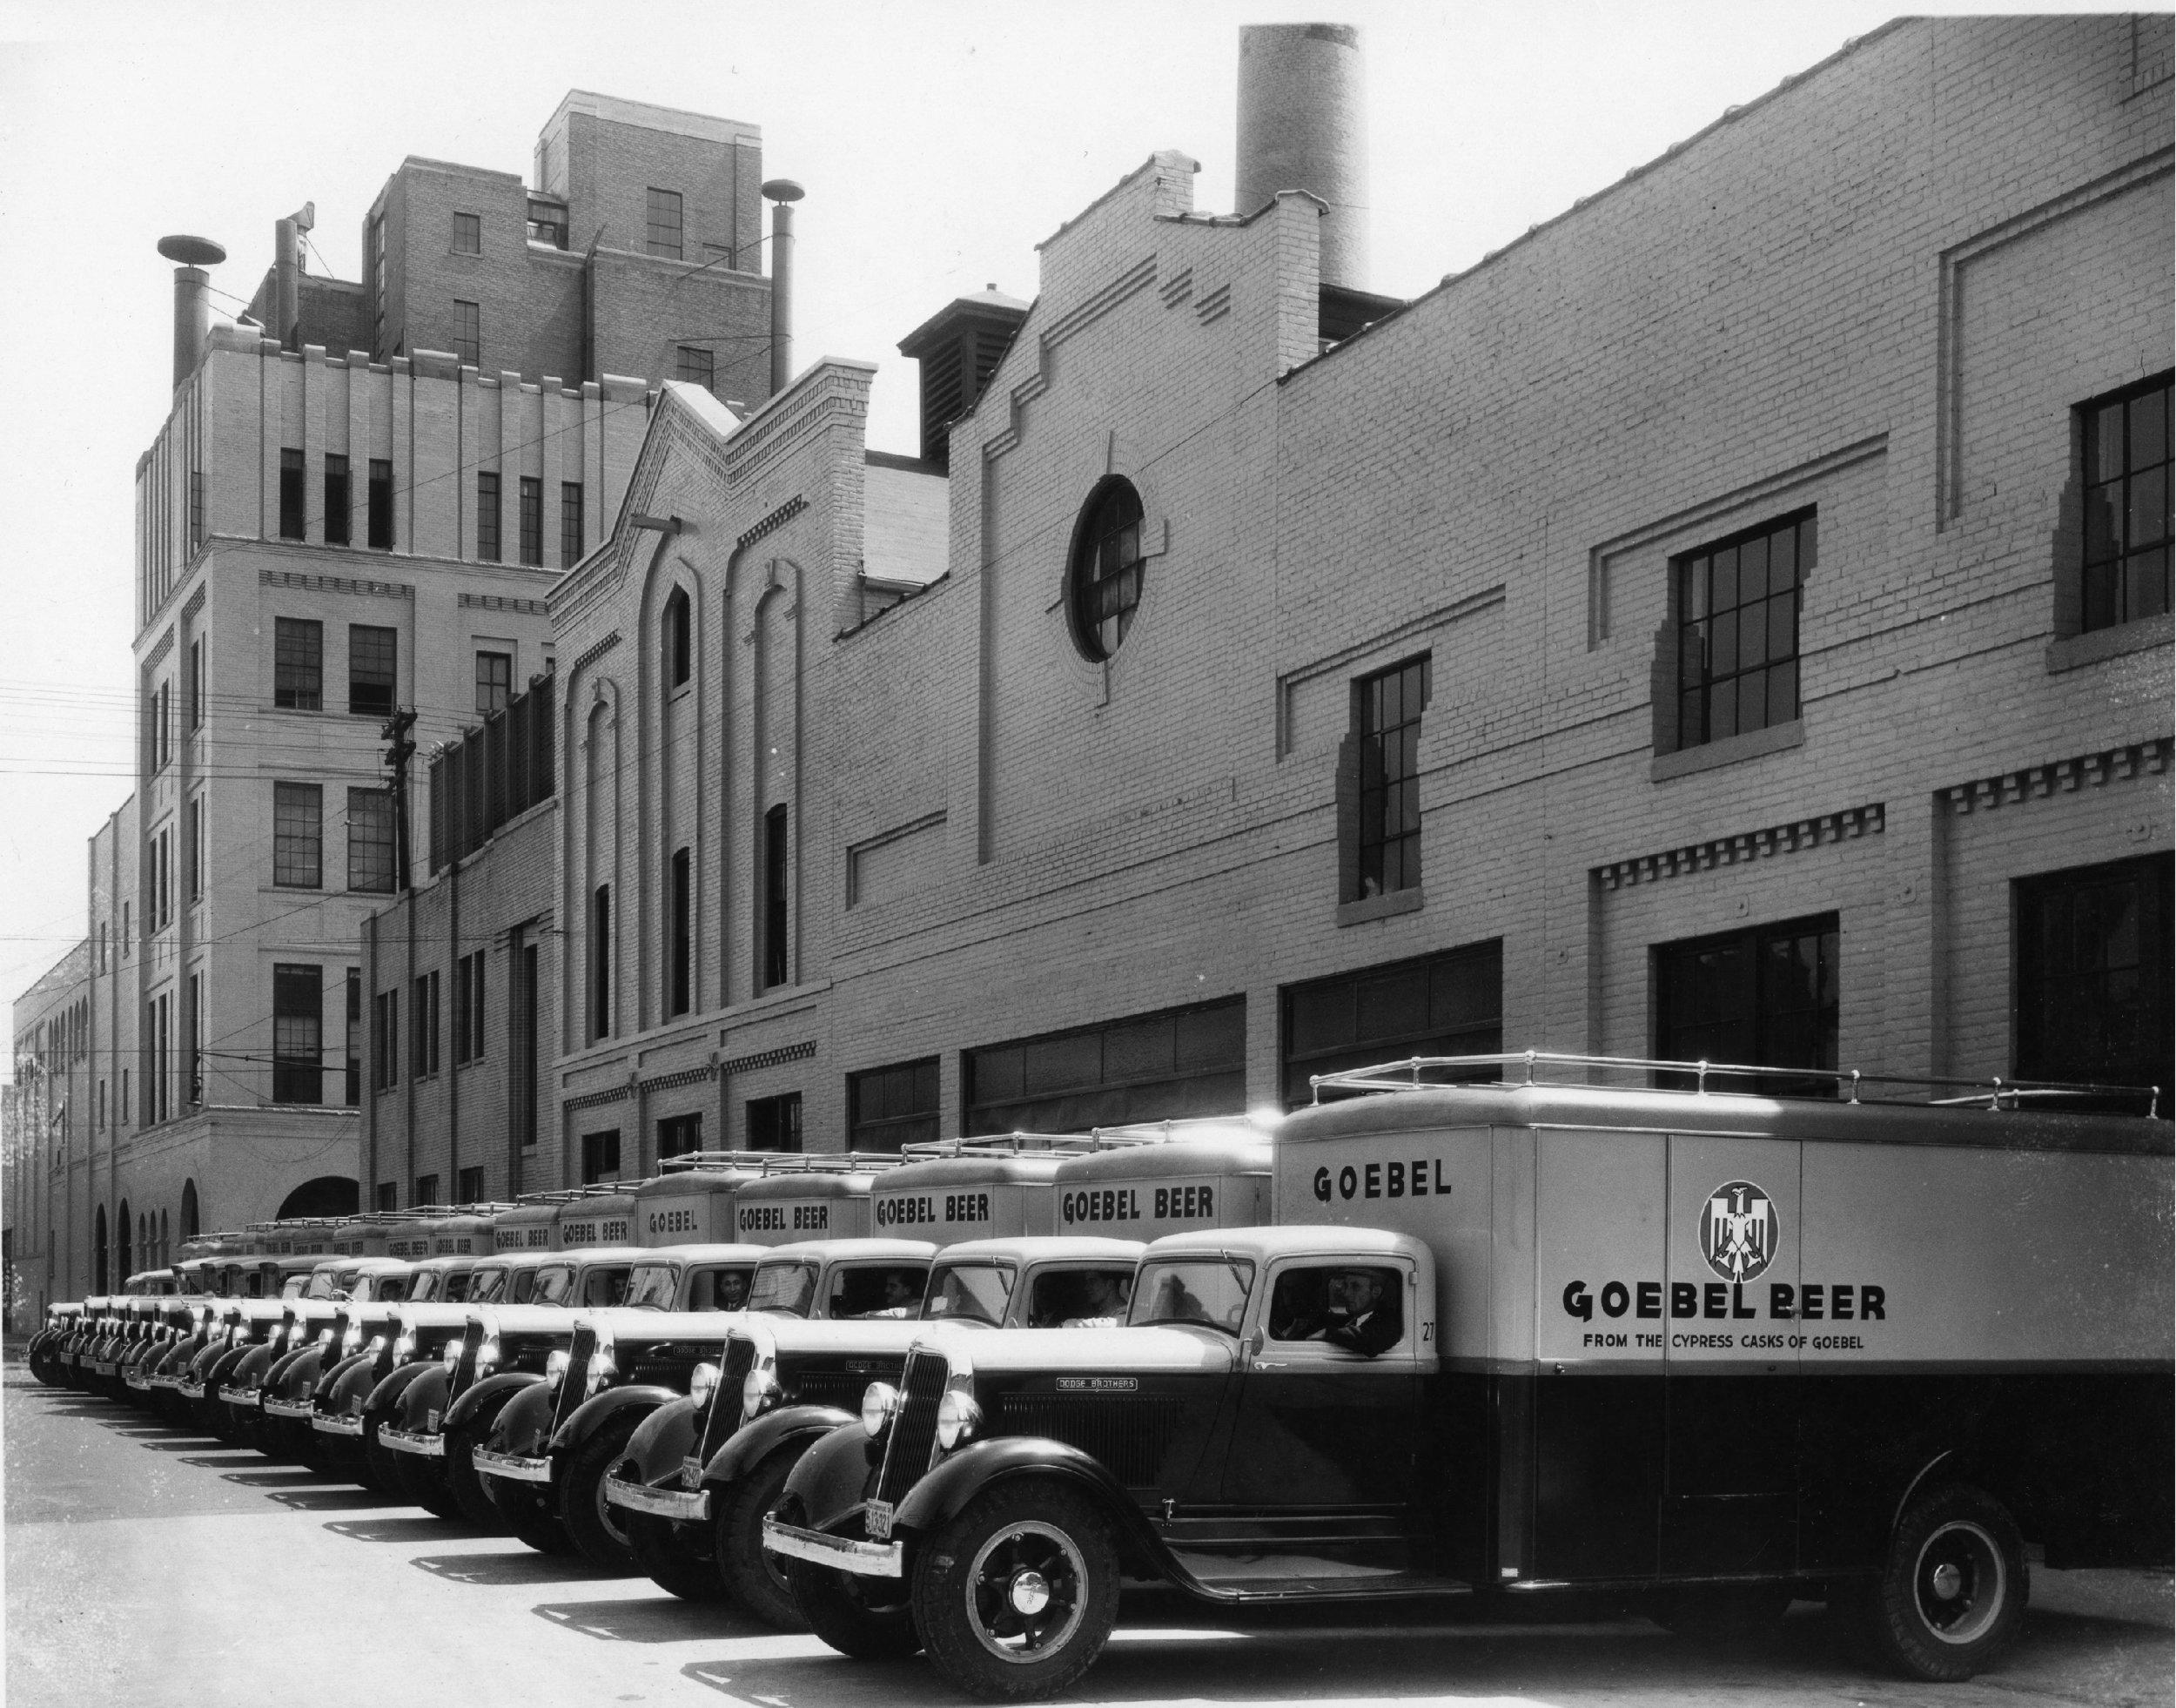 118403 Goebel Brewing Trucks May 1 1934 small.jpg